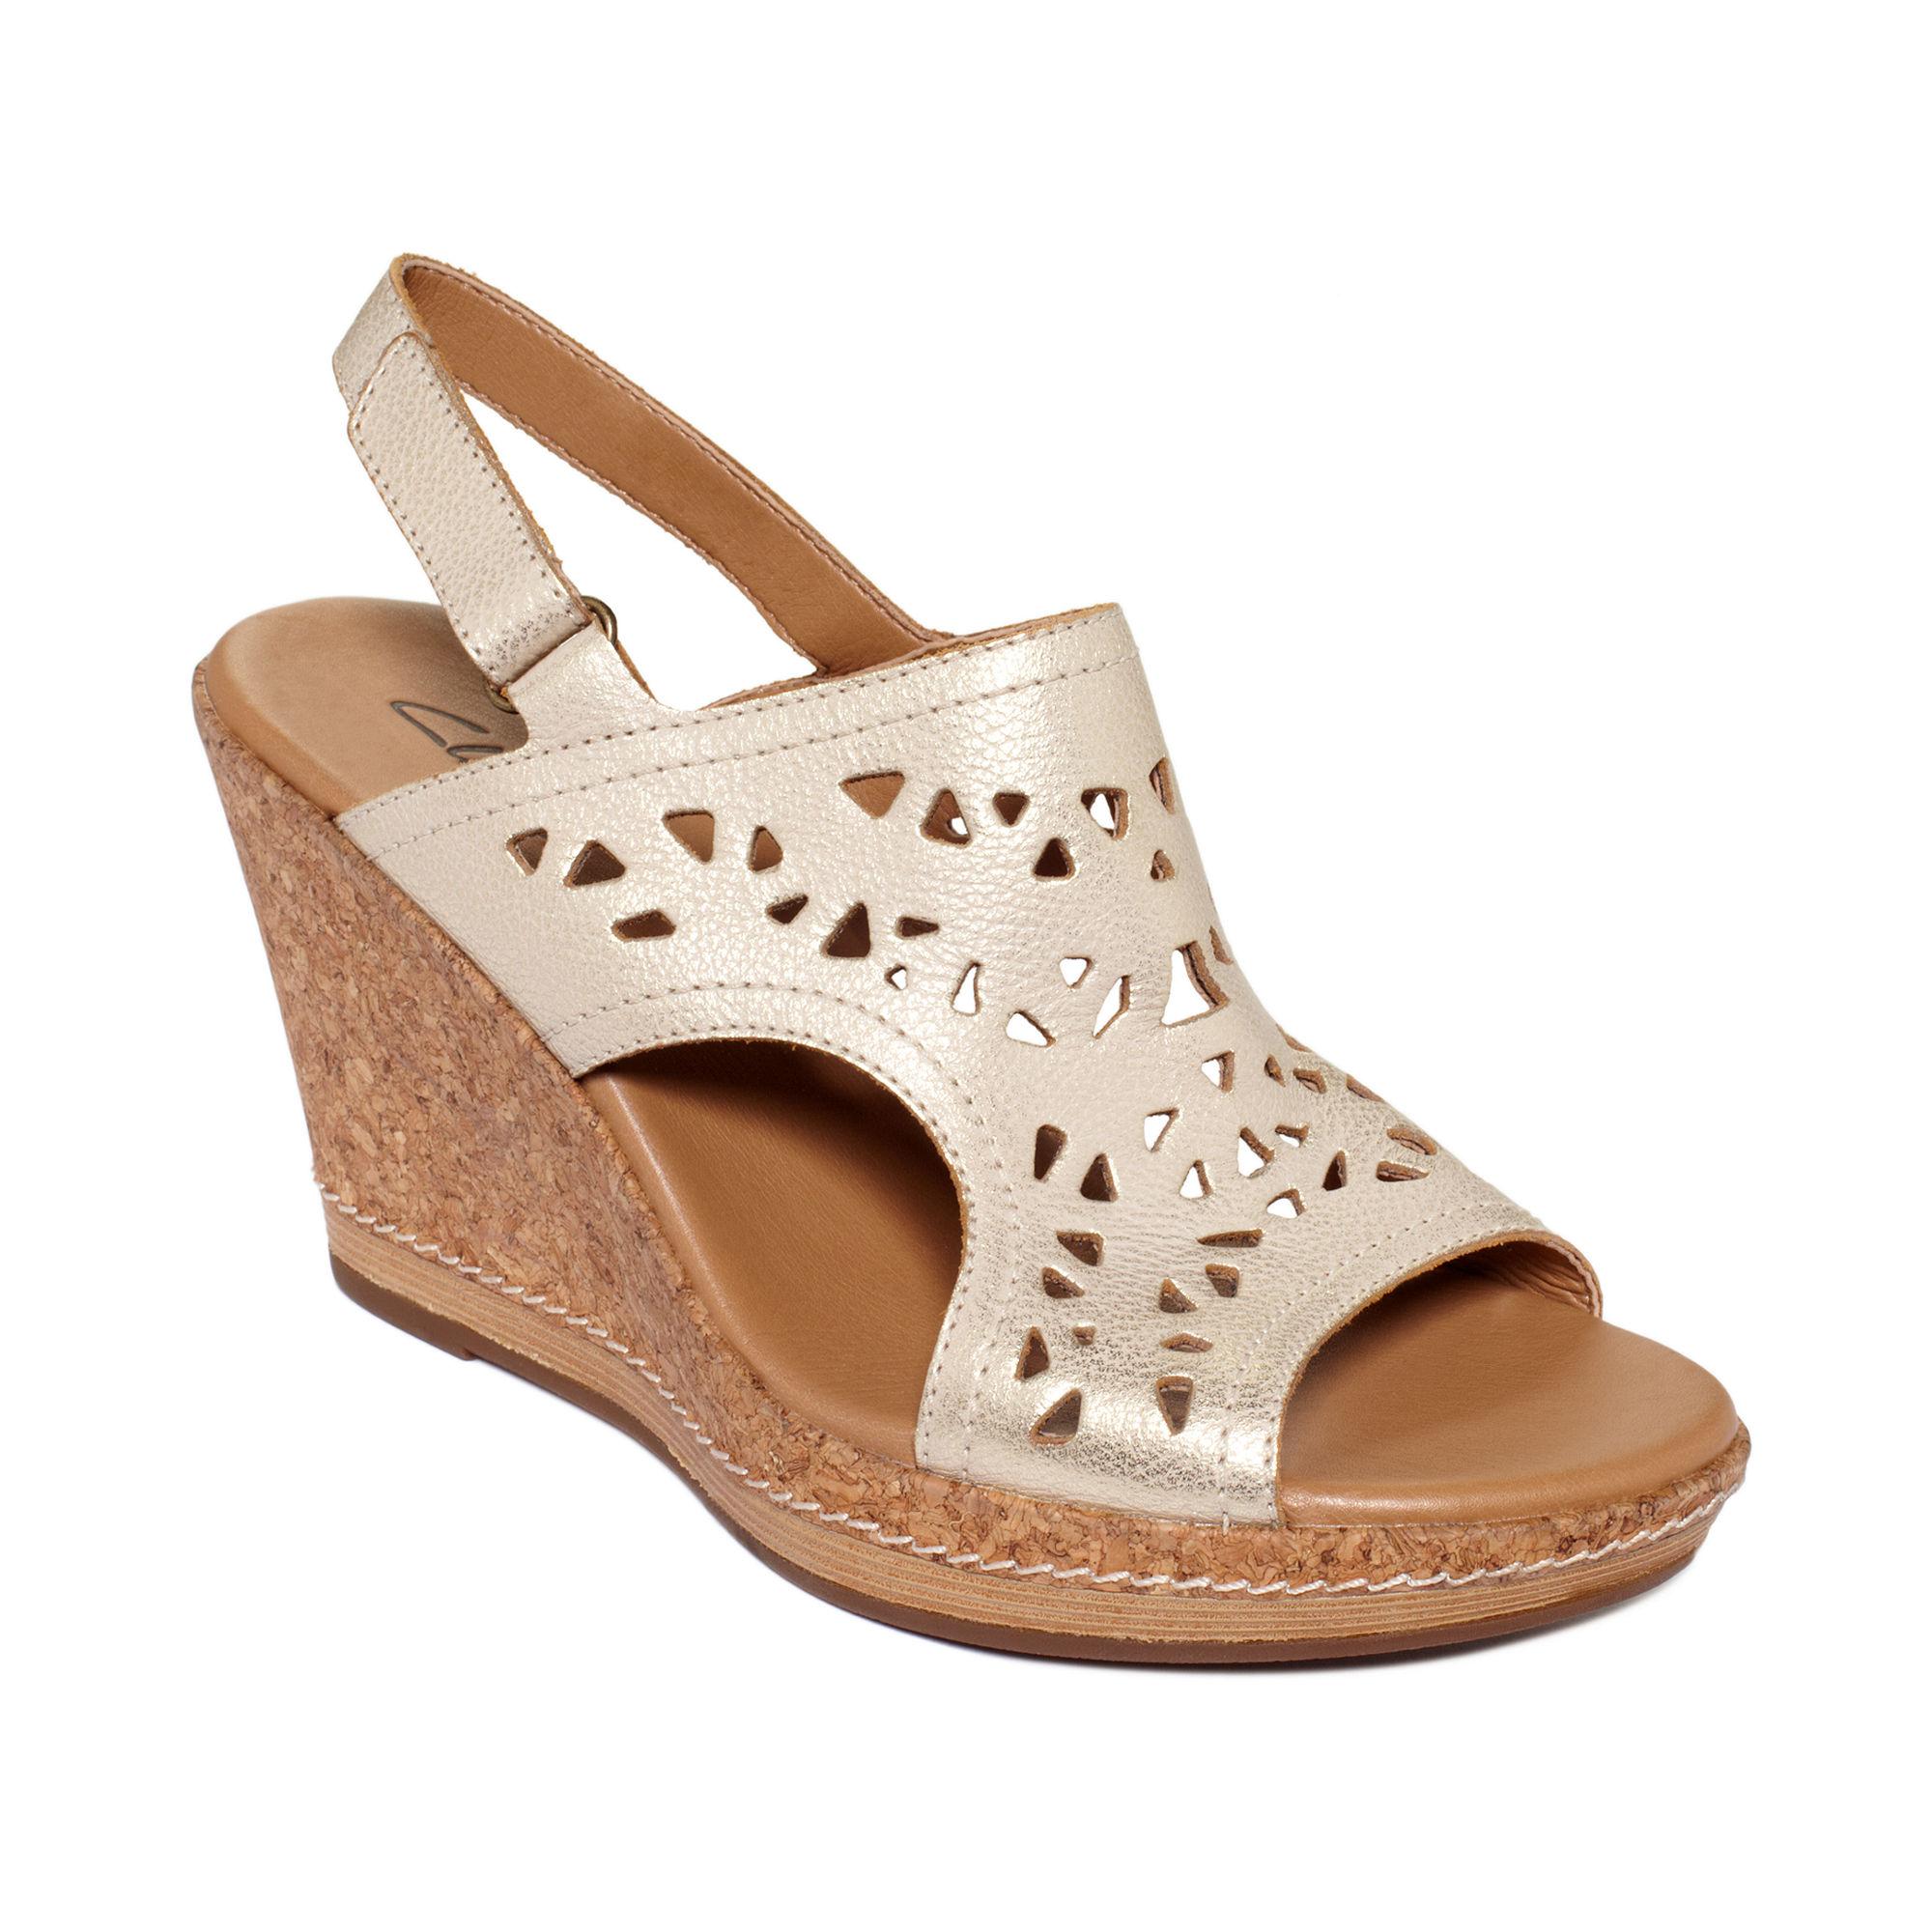 clarks pitch mint platform wedge sandals in lyst